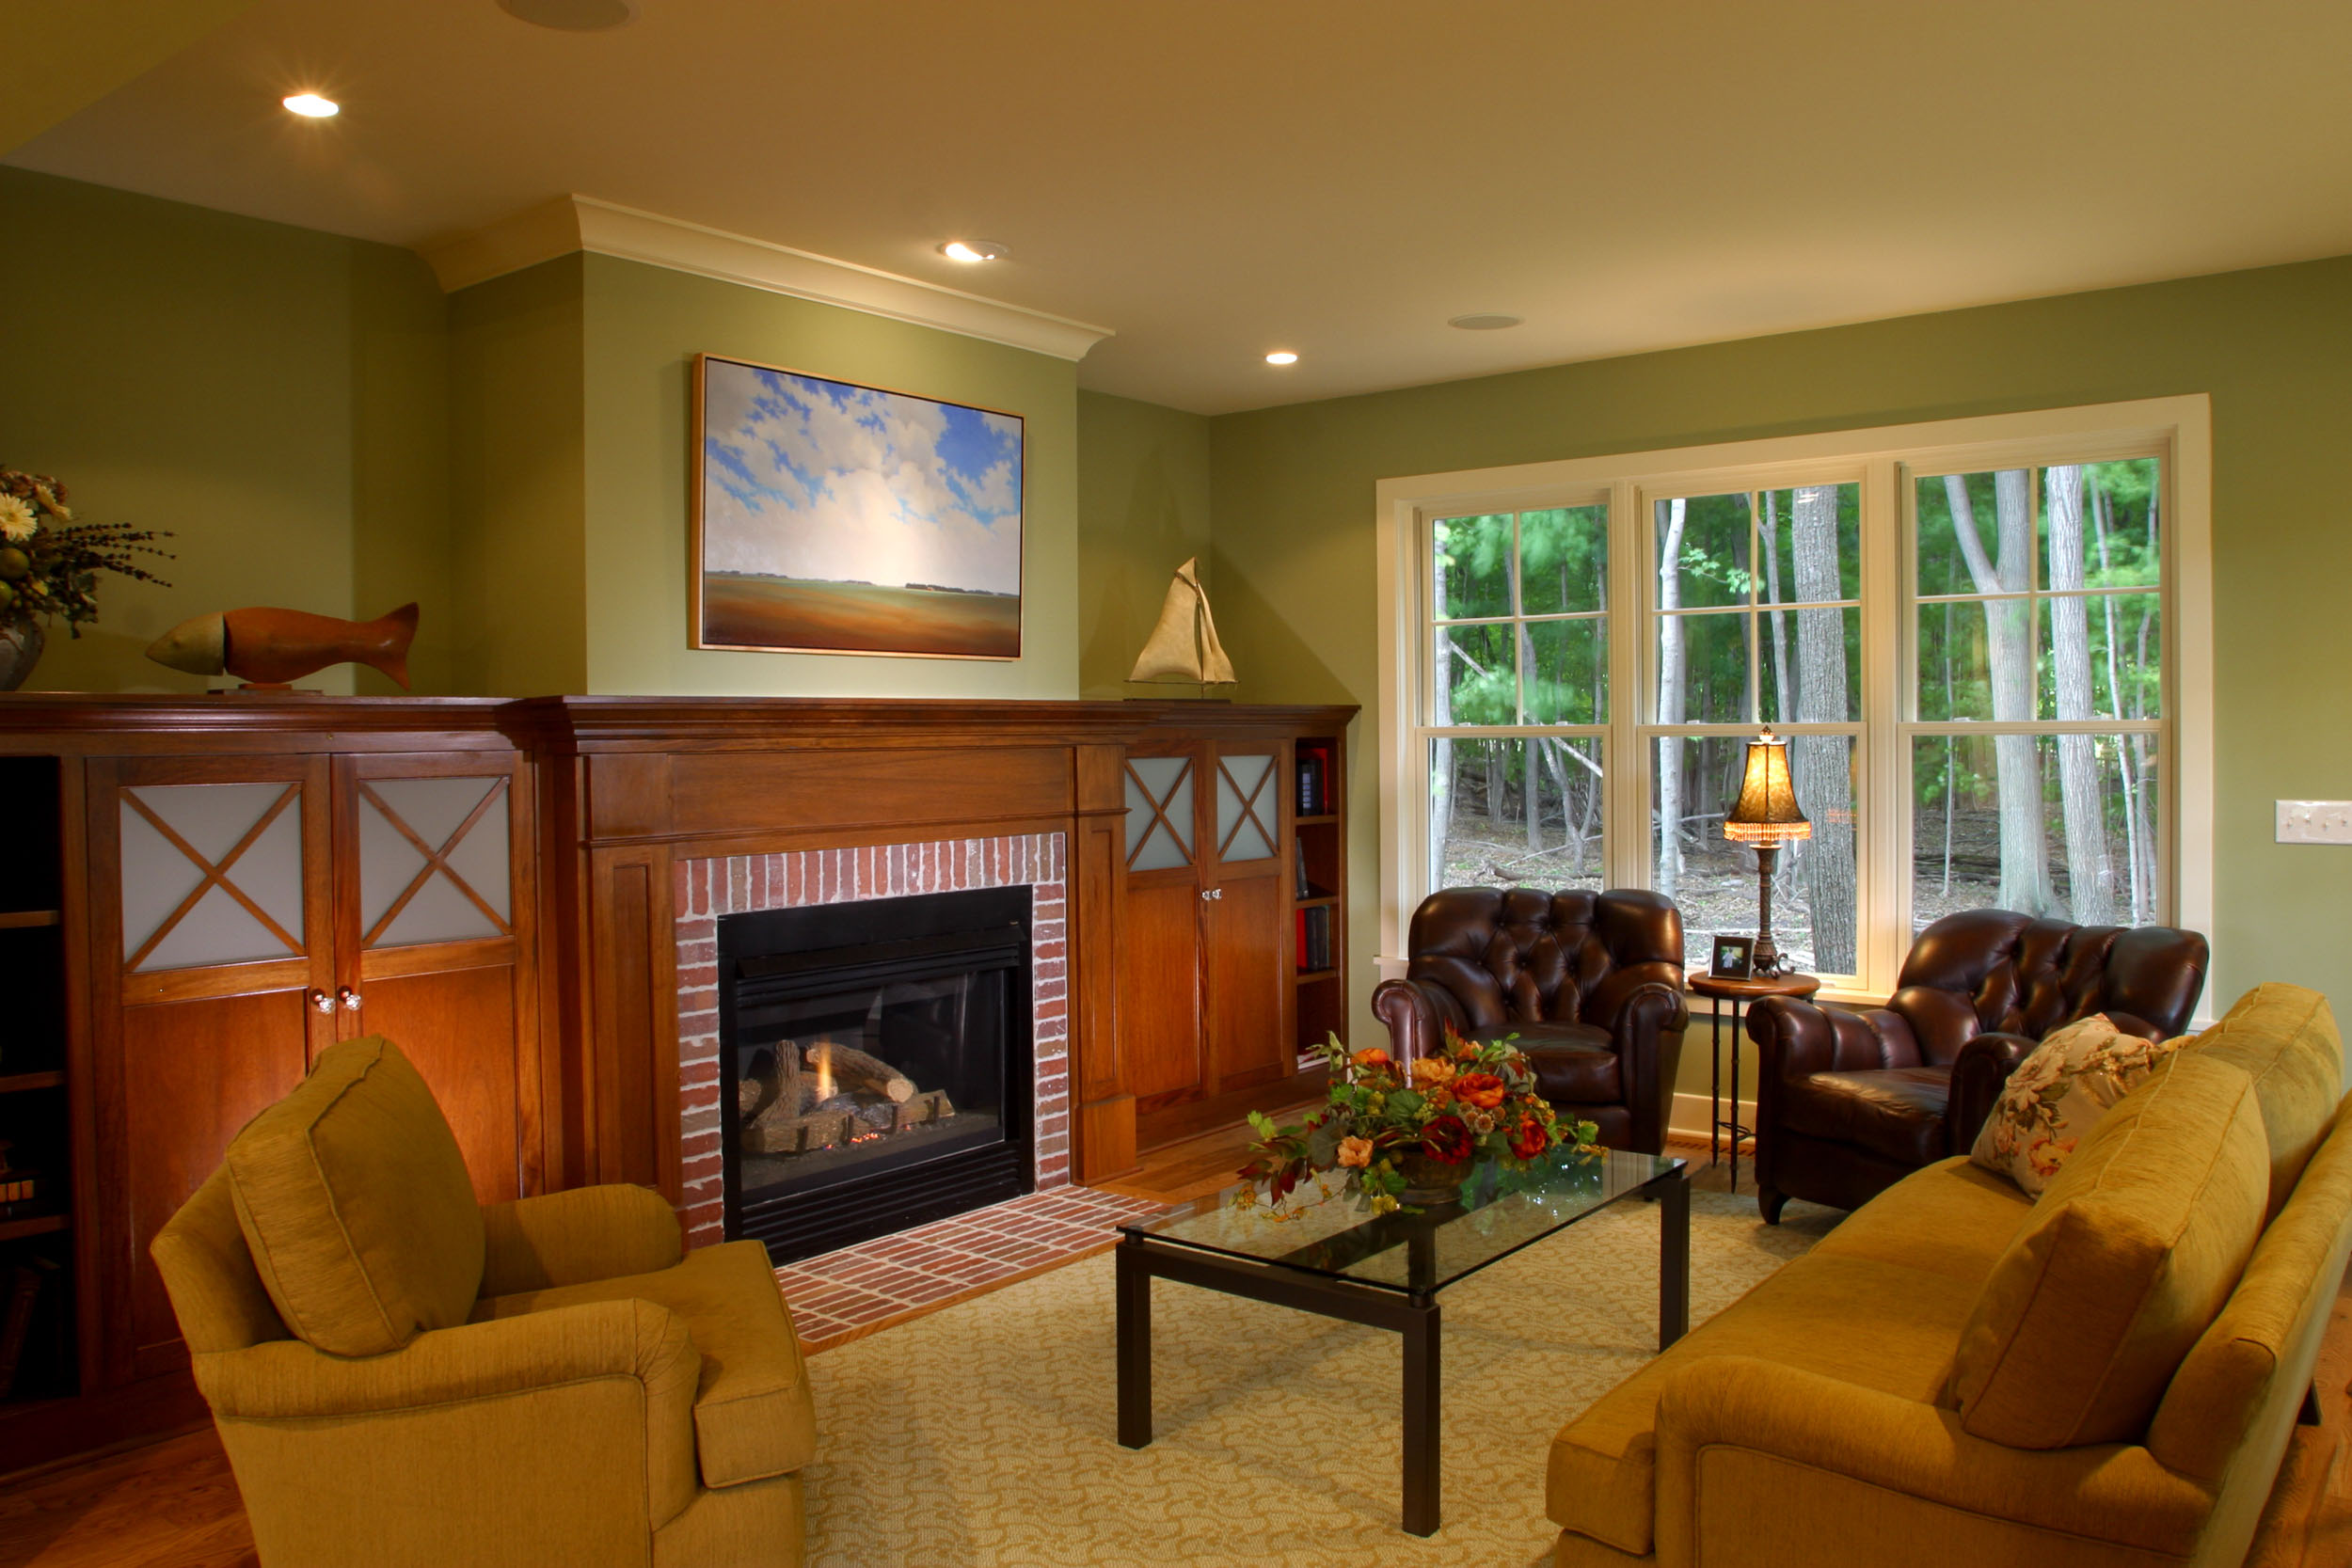 Modern Cottage Fireplace Image